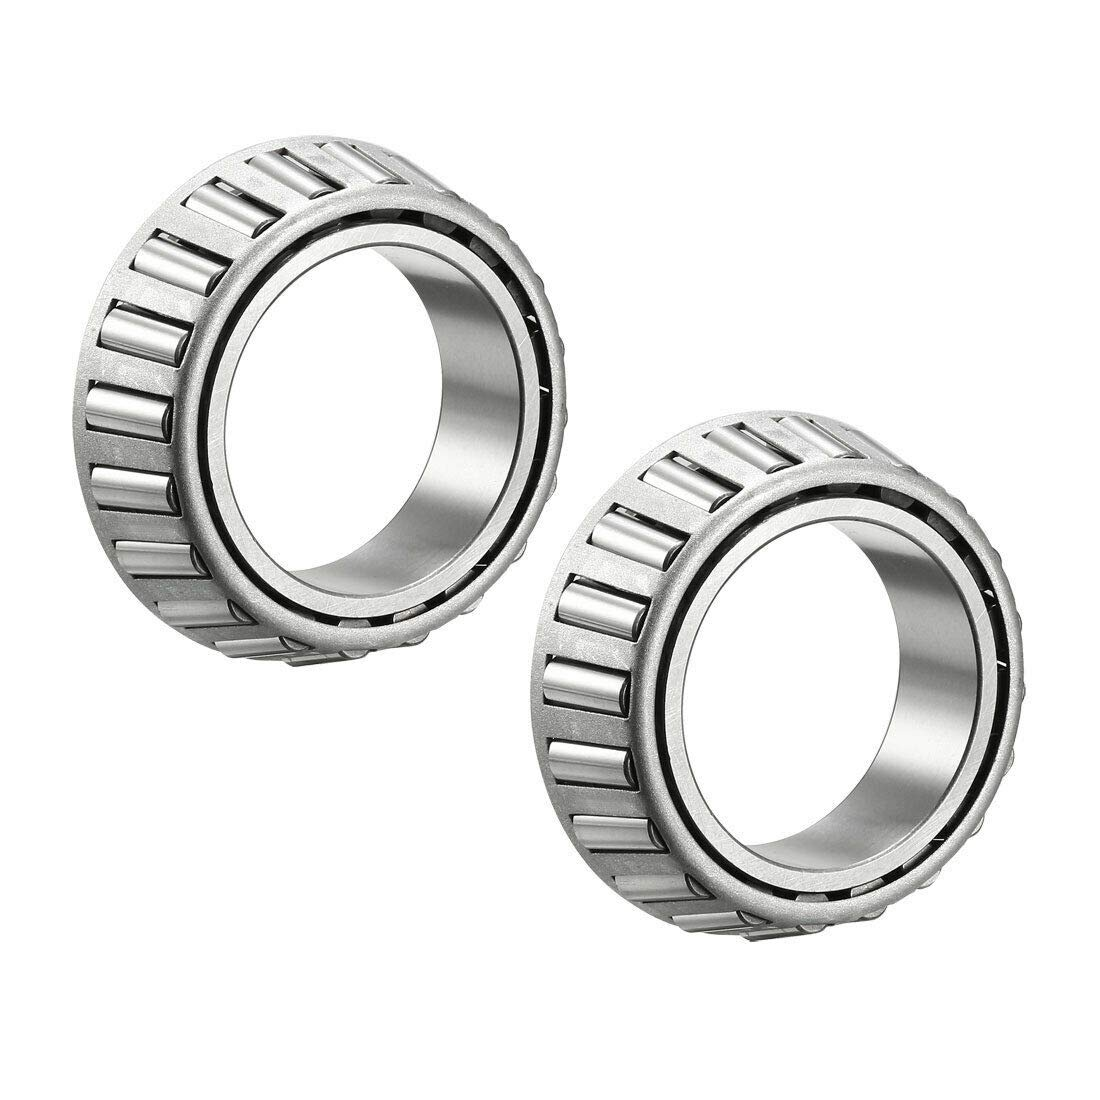 Bearings & Bushings 368A Tapered Roller Bearing Single Cone 2